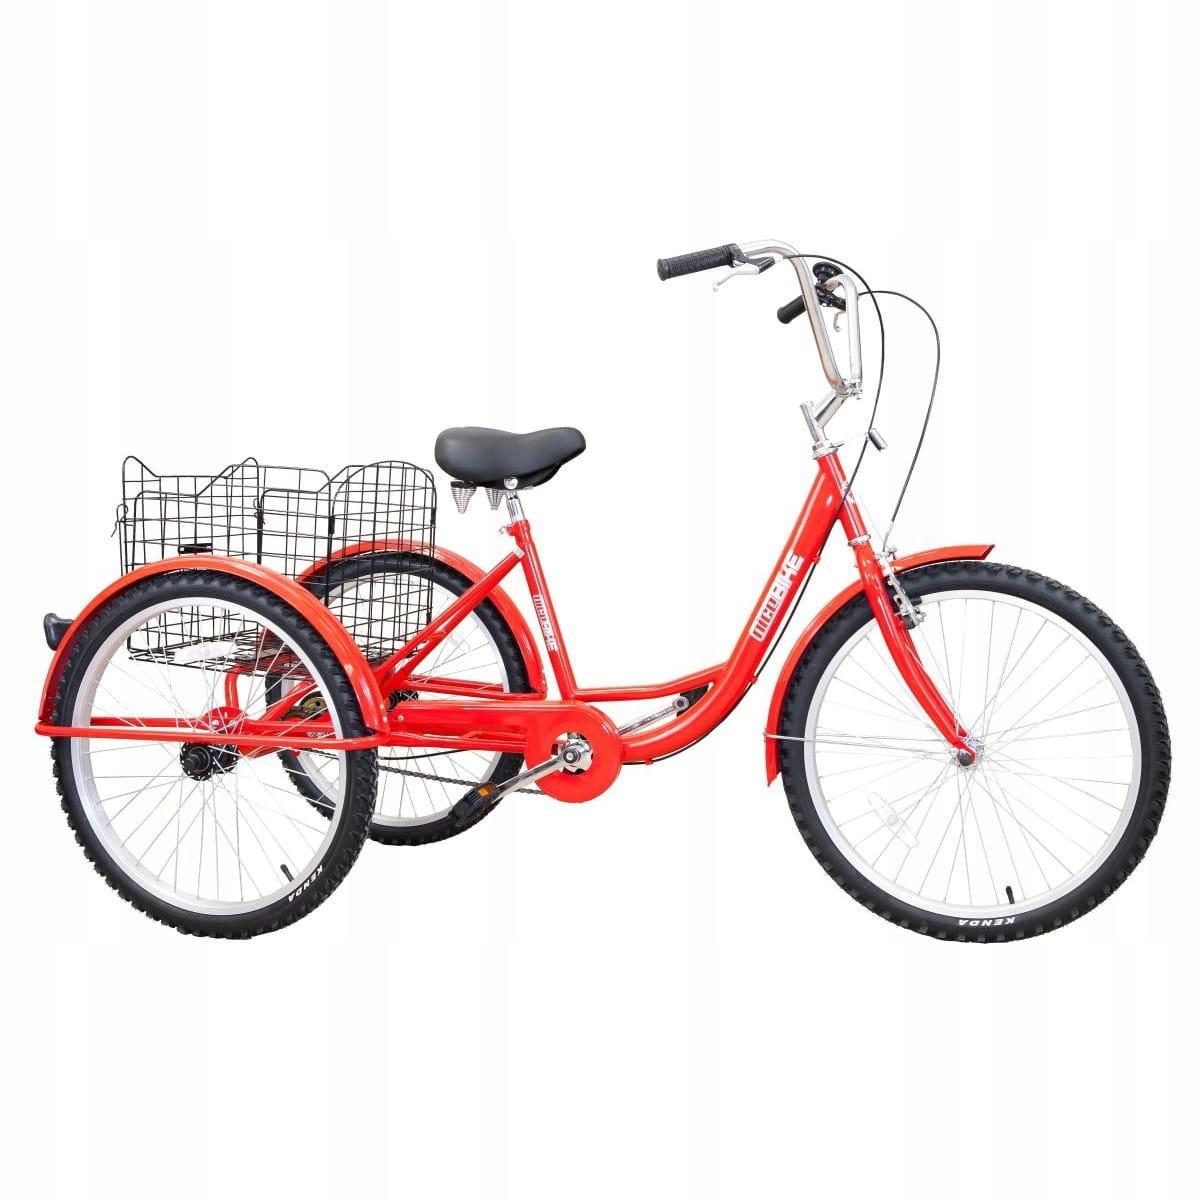 Bike 3-koliesko trojkolka rehabilitačné kolesa 24